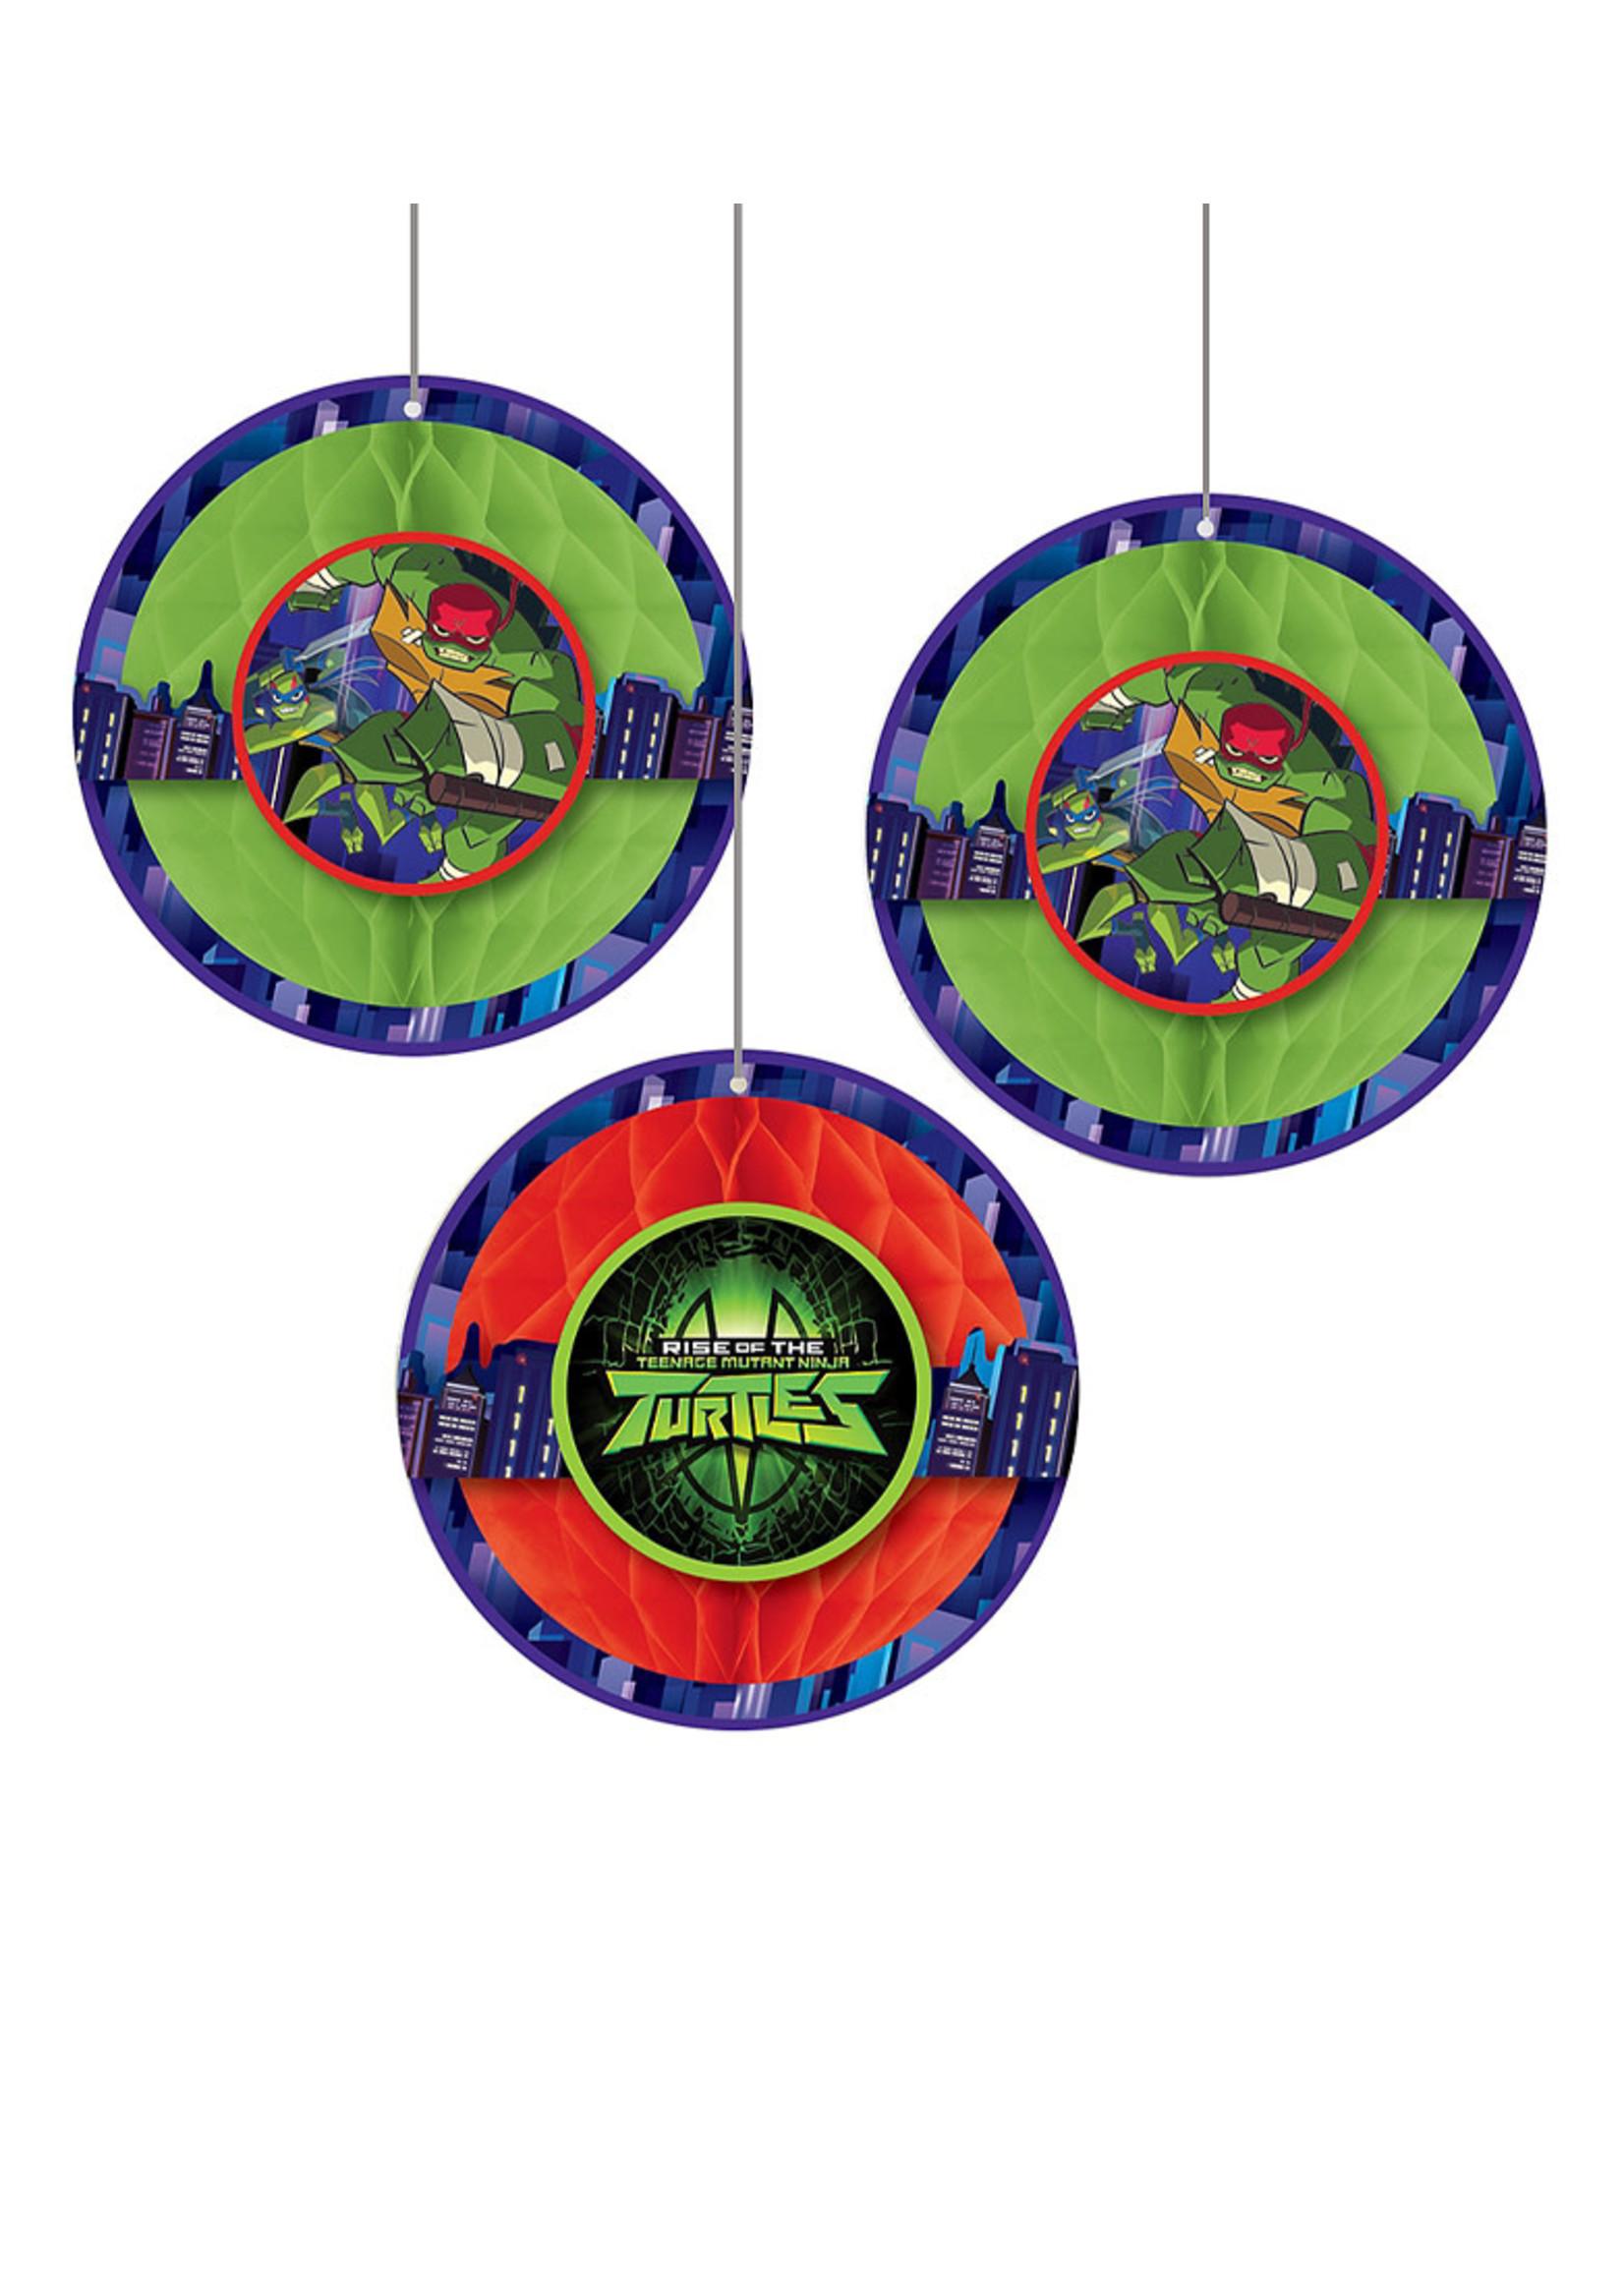 Rise of the Teenage Mutant Ninja Turtles Honeycomb Balls 3ct